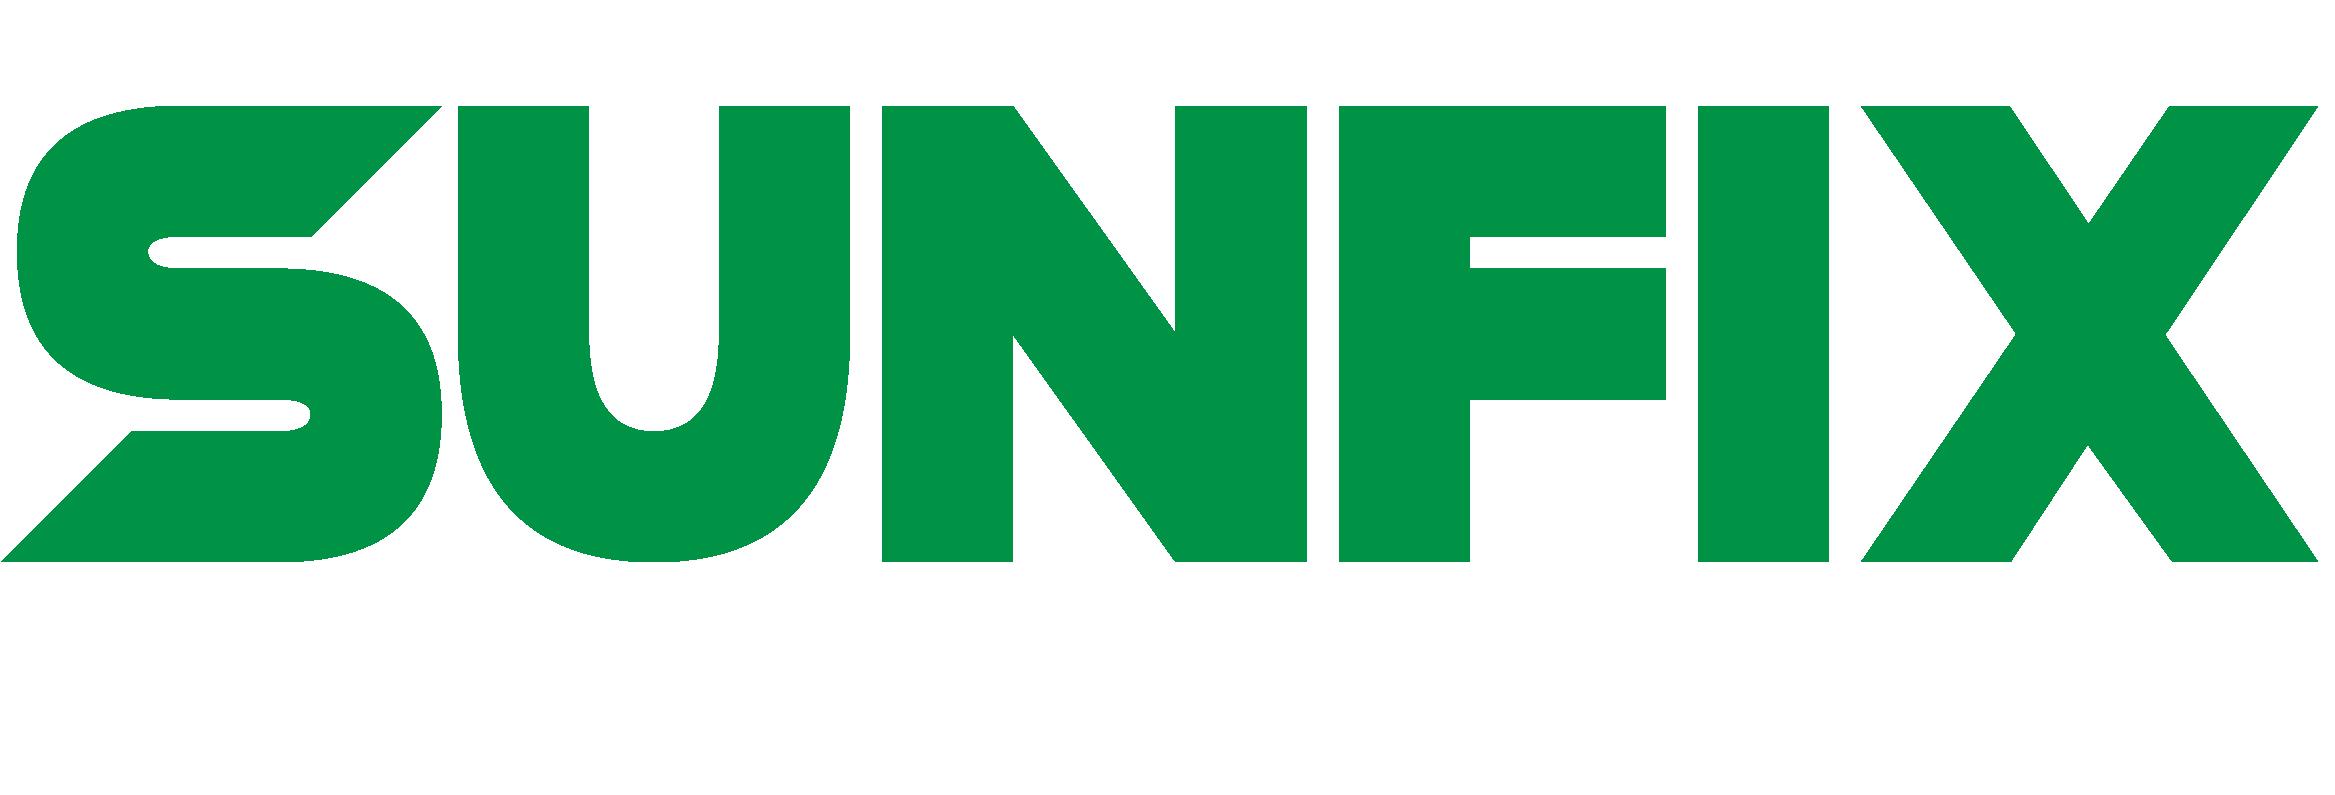 https://secureservercdn.net/198.71.233.199/sz0.269.myftpupload.com/wp-content/uploads/2020/10/SUNFIX-Consulting-W.png?time=1627699607